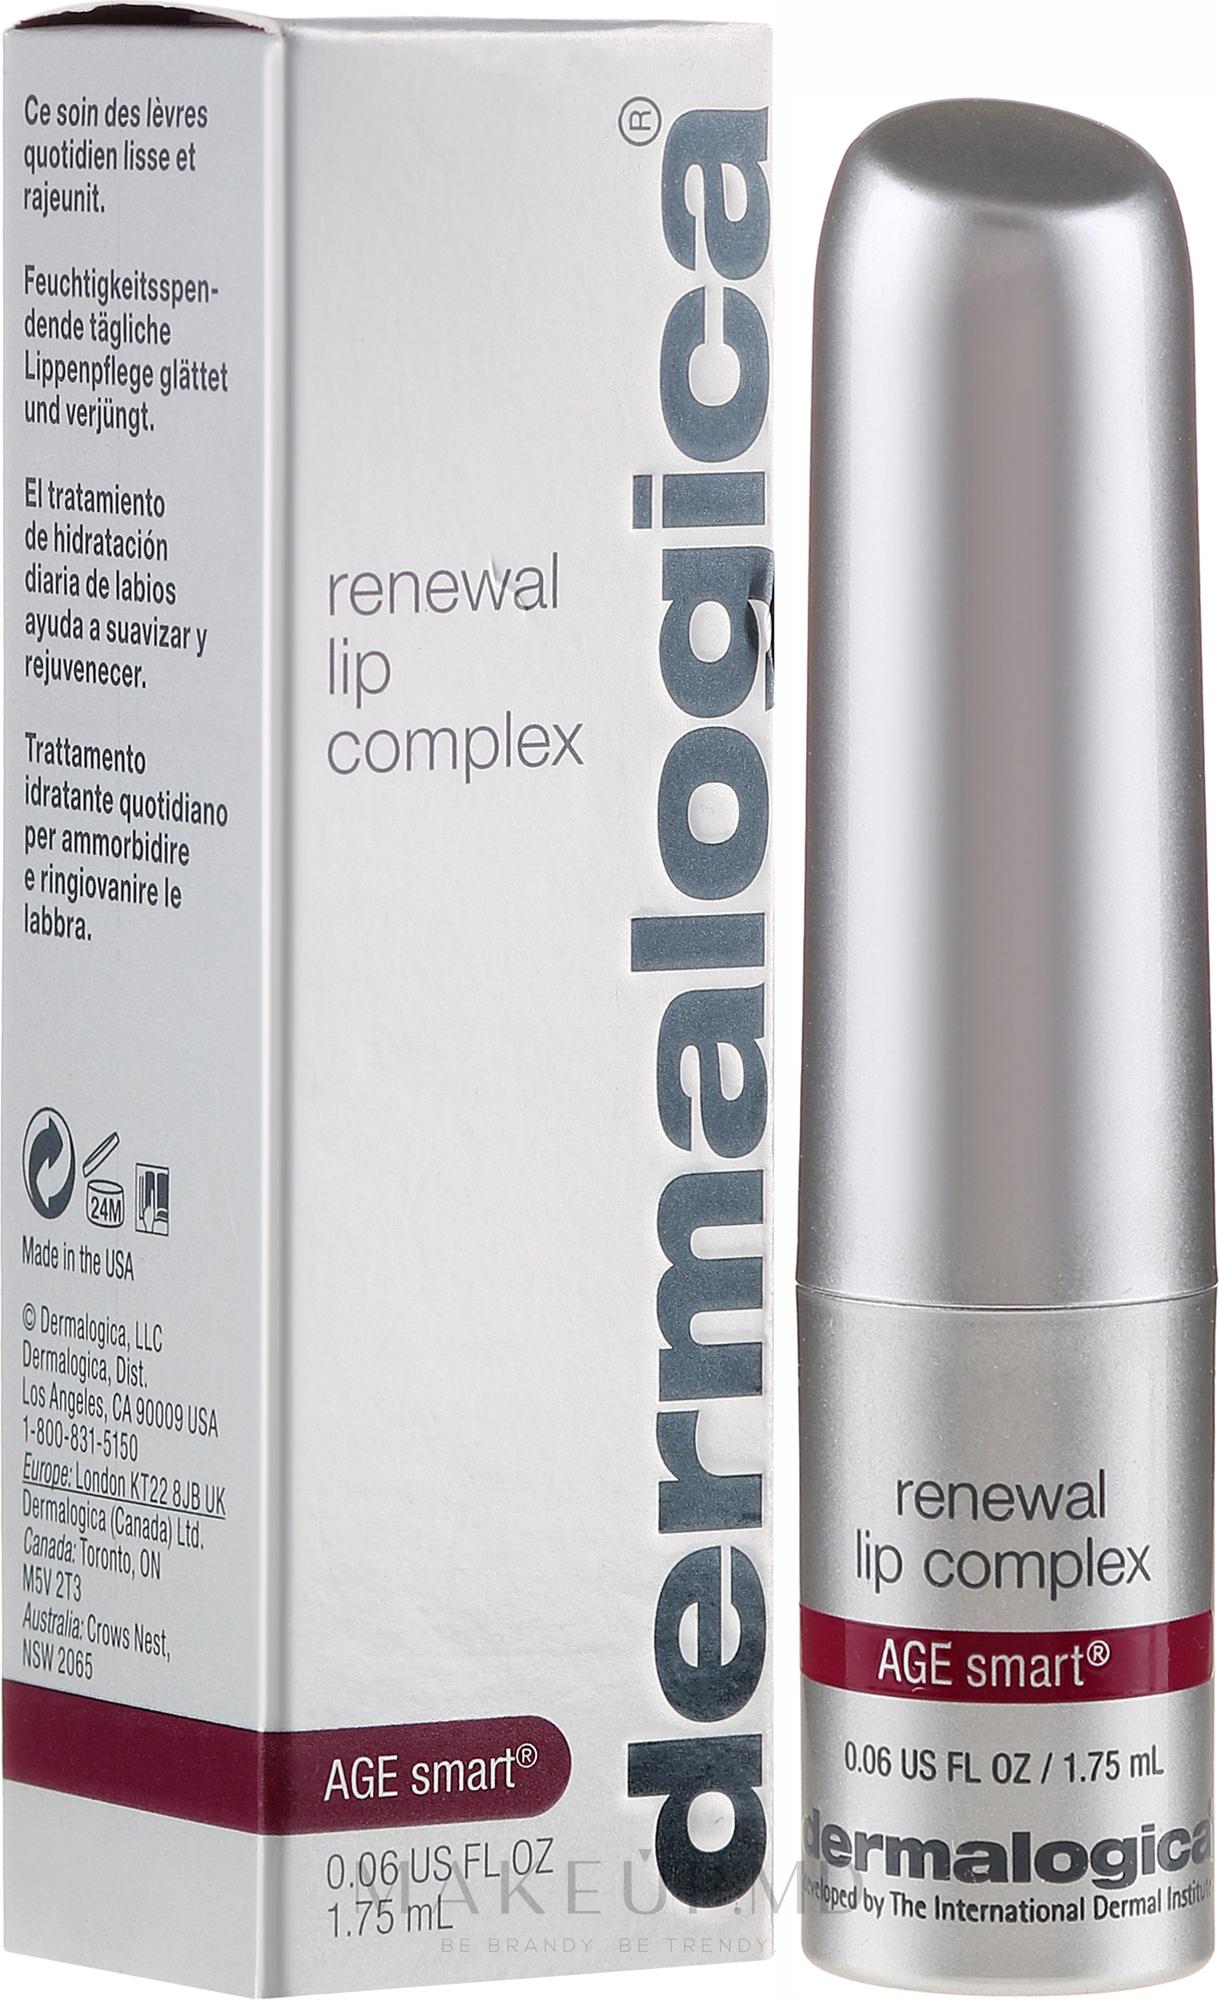 Balsam de buze - Dermalogica Age Smart Renewal Lip Complex — Imagine 1.75 ml